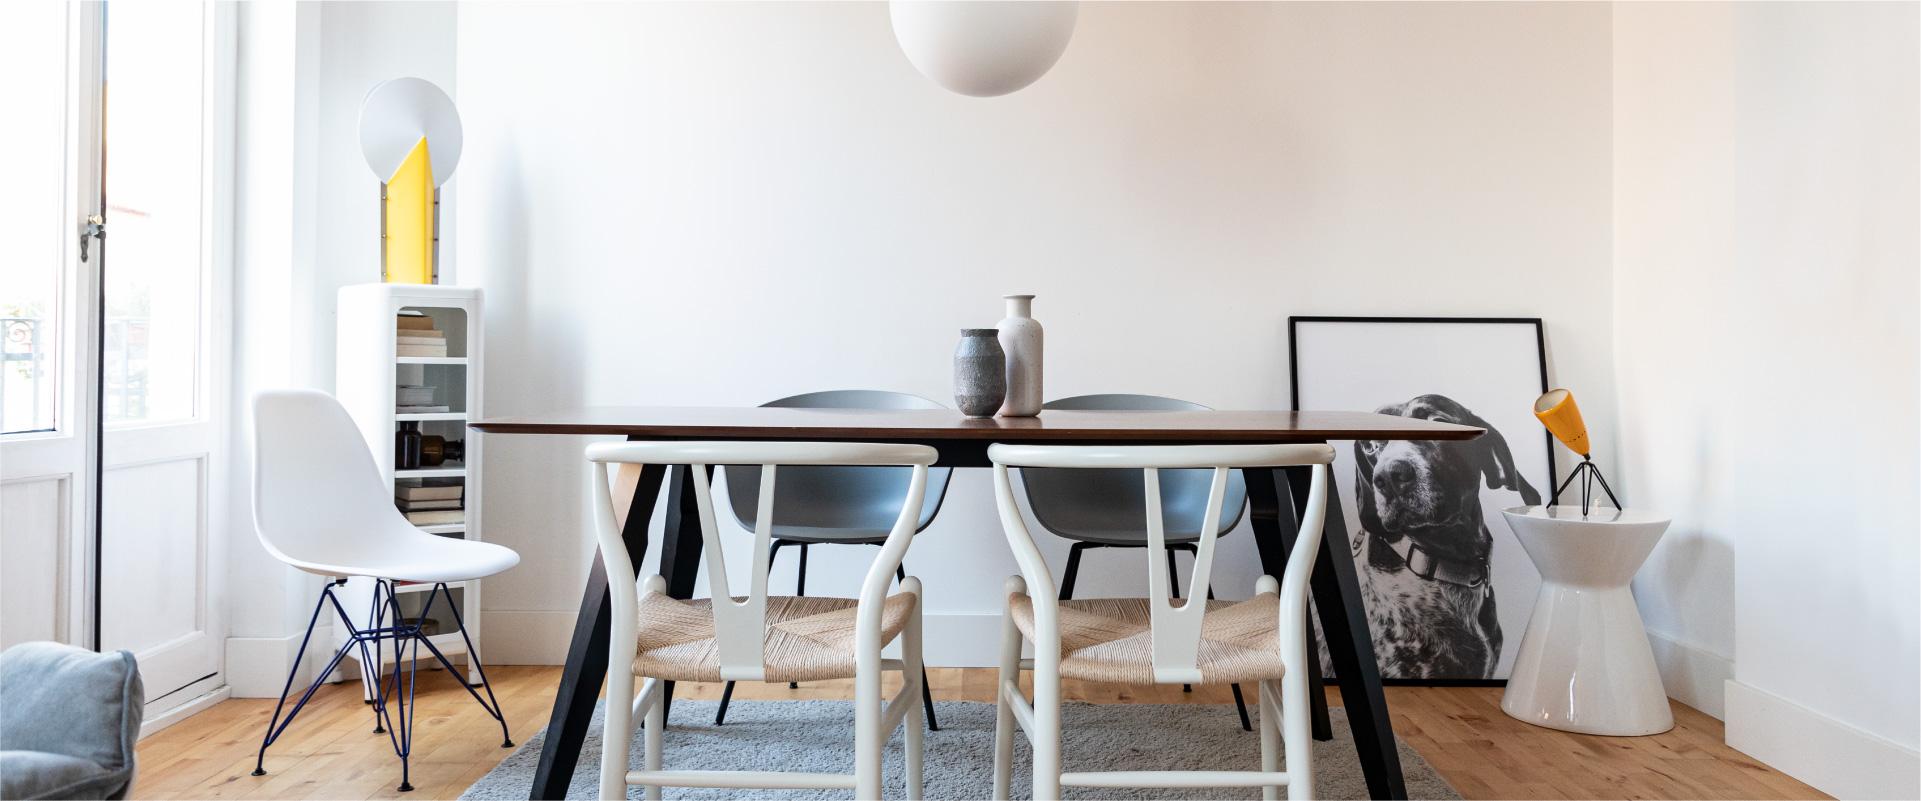 Arredamento Cucina Stile Nordico stile nordico - sklum